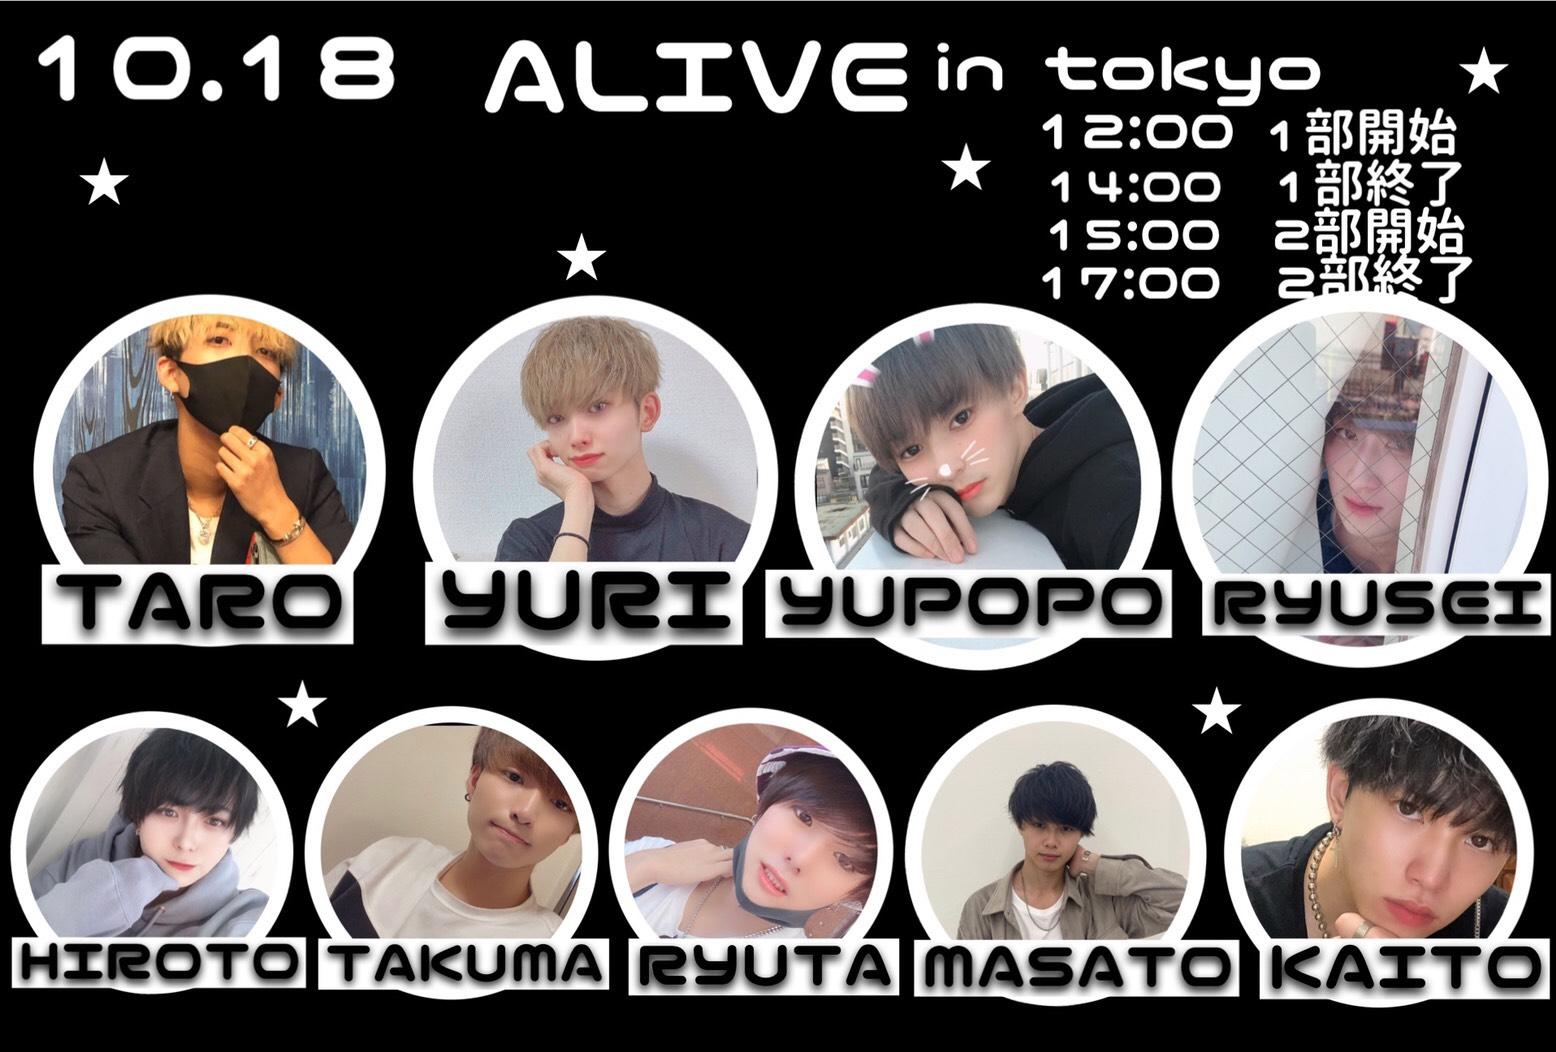 ALIVE IN TOKYO